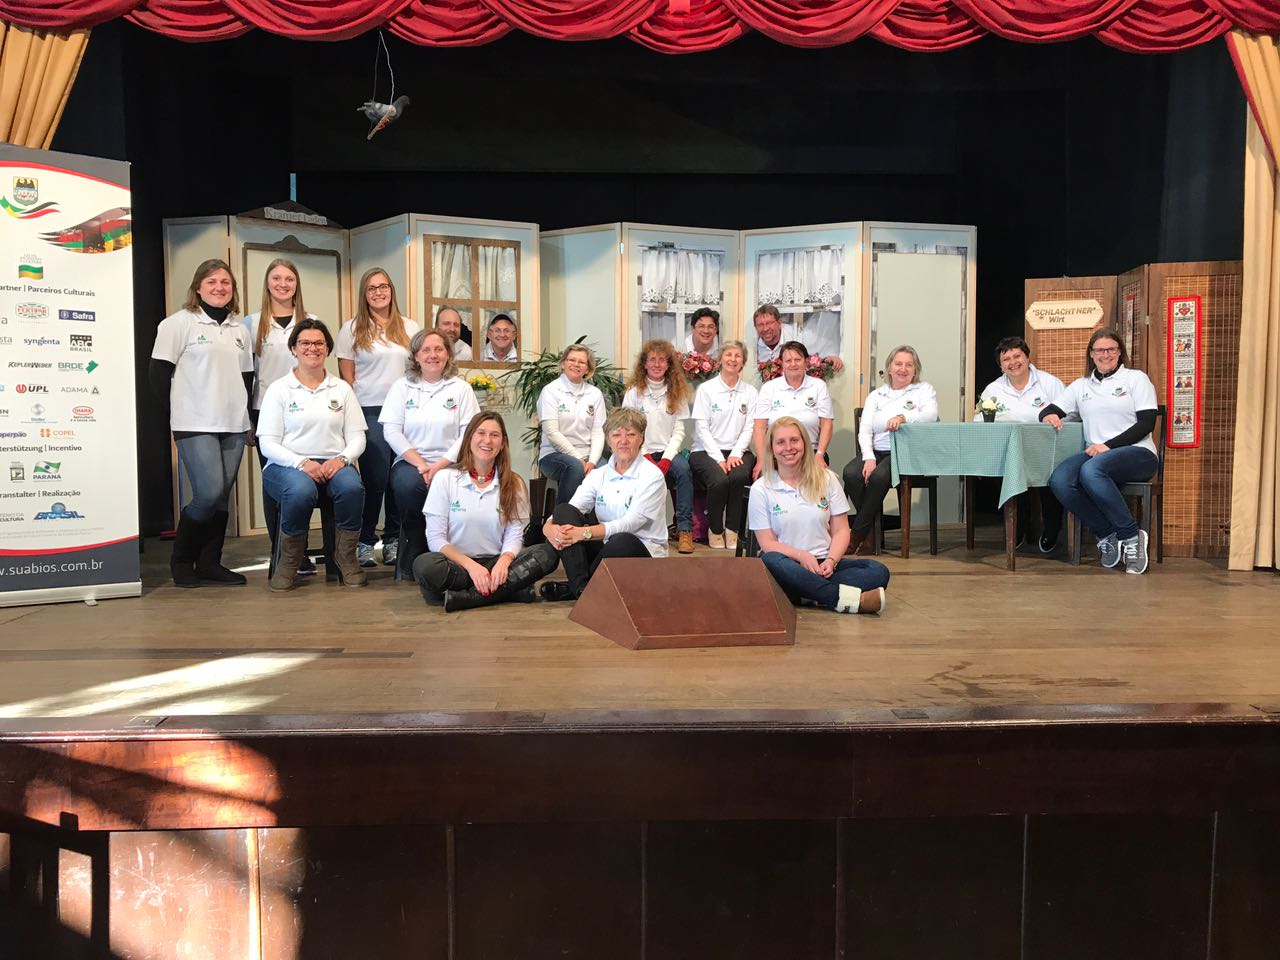 Grupo de teatro Thomas Schwarz em Blumenau - 22.07.2017 Grupo de teatro Thomas Schwarz em Blumenau - 22.07.2017